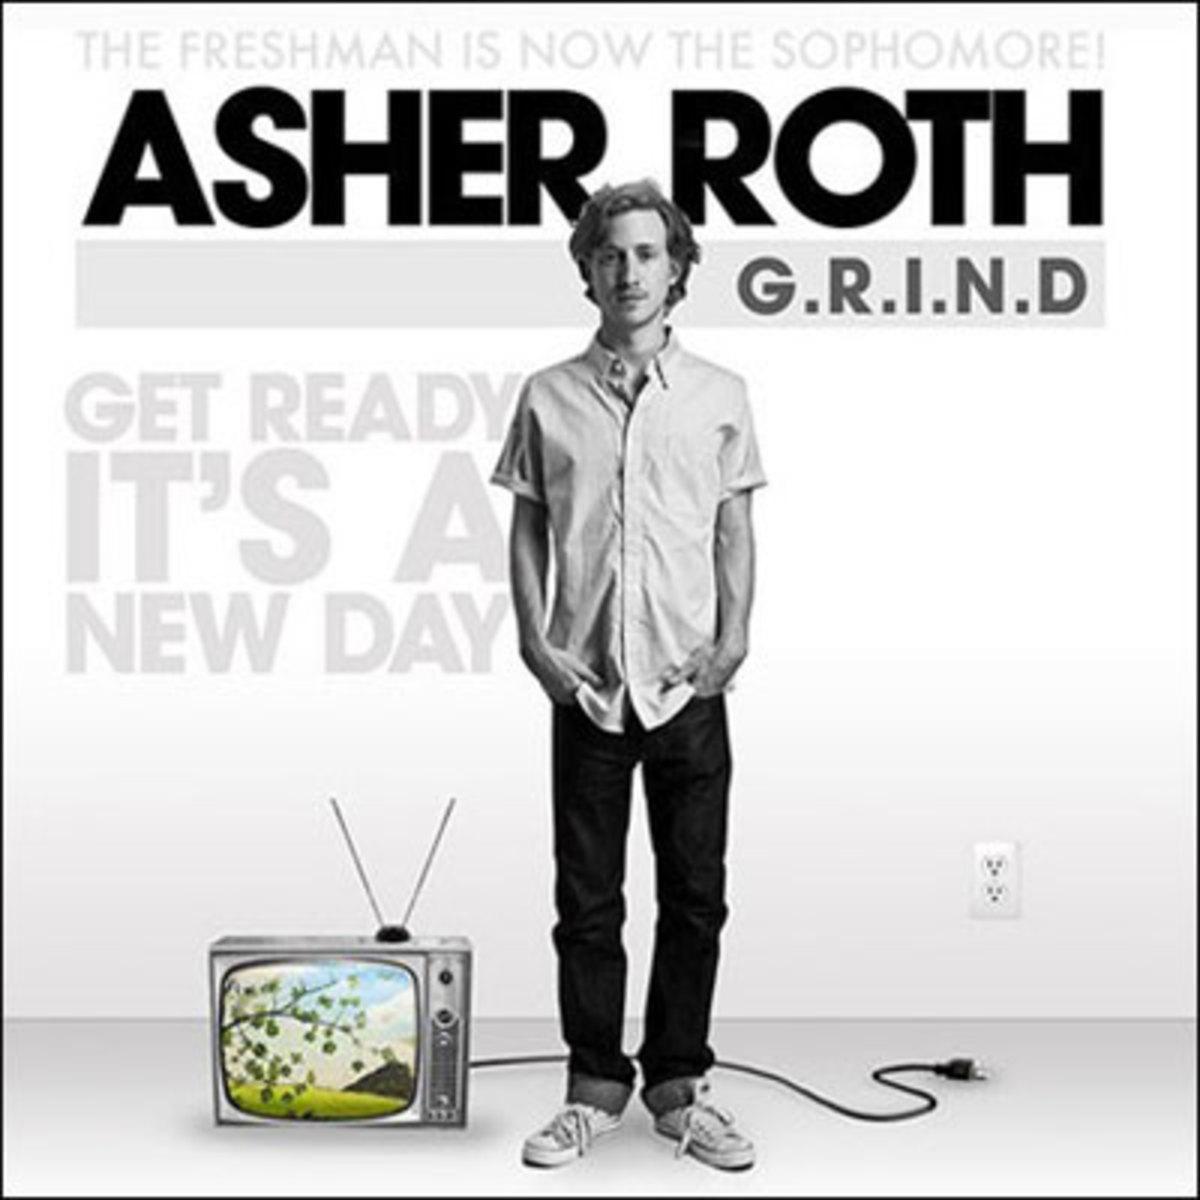 asherroth-grind.jpg